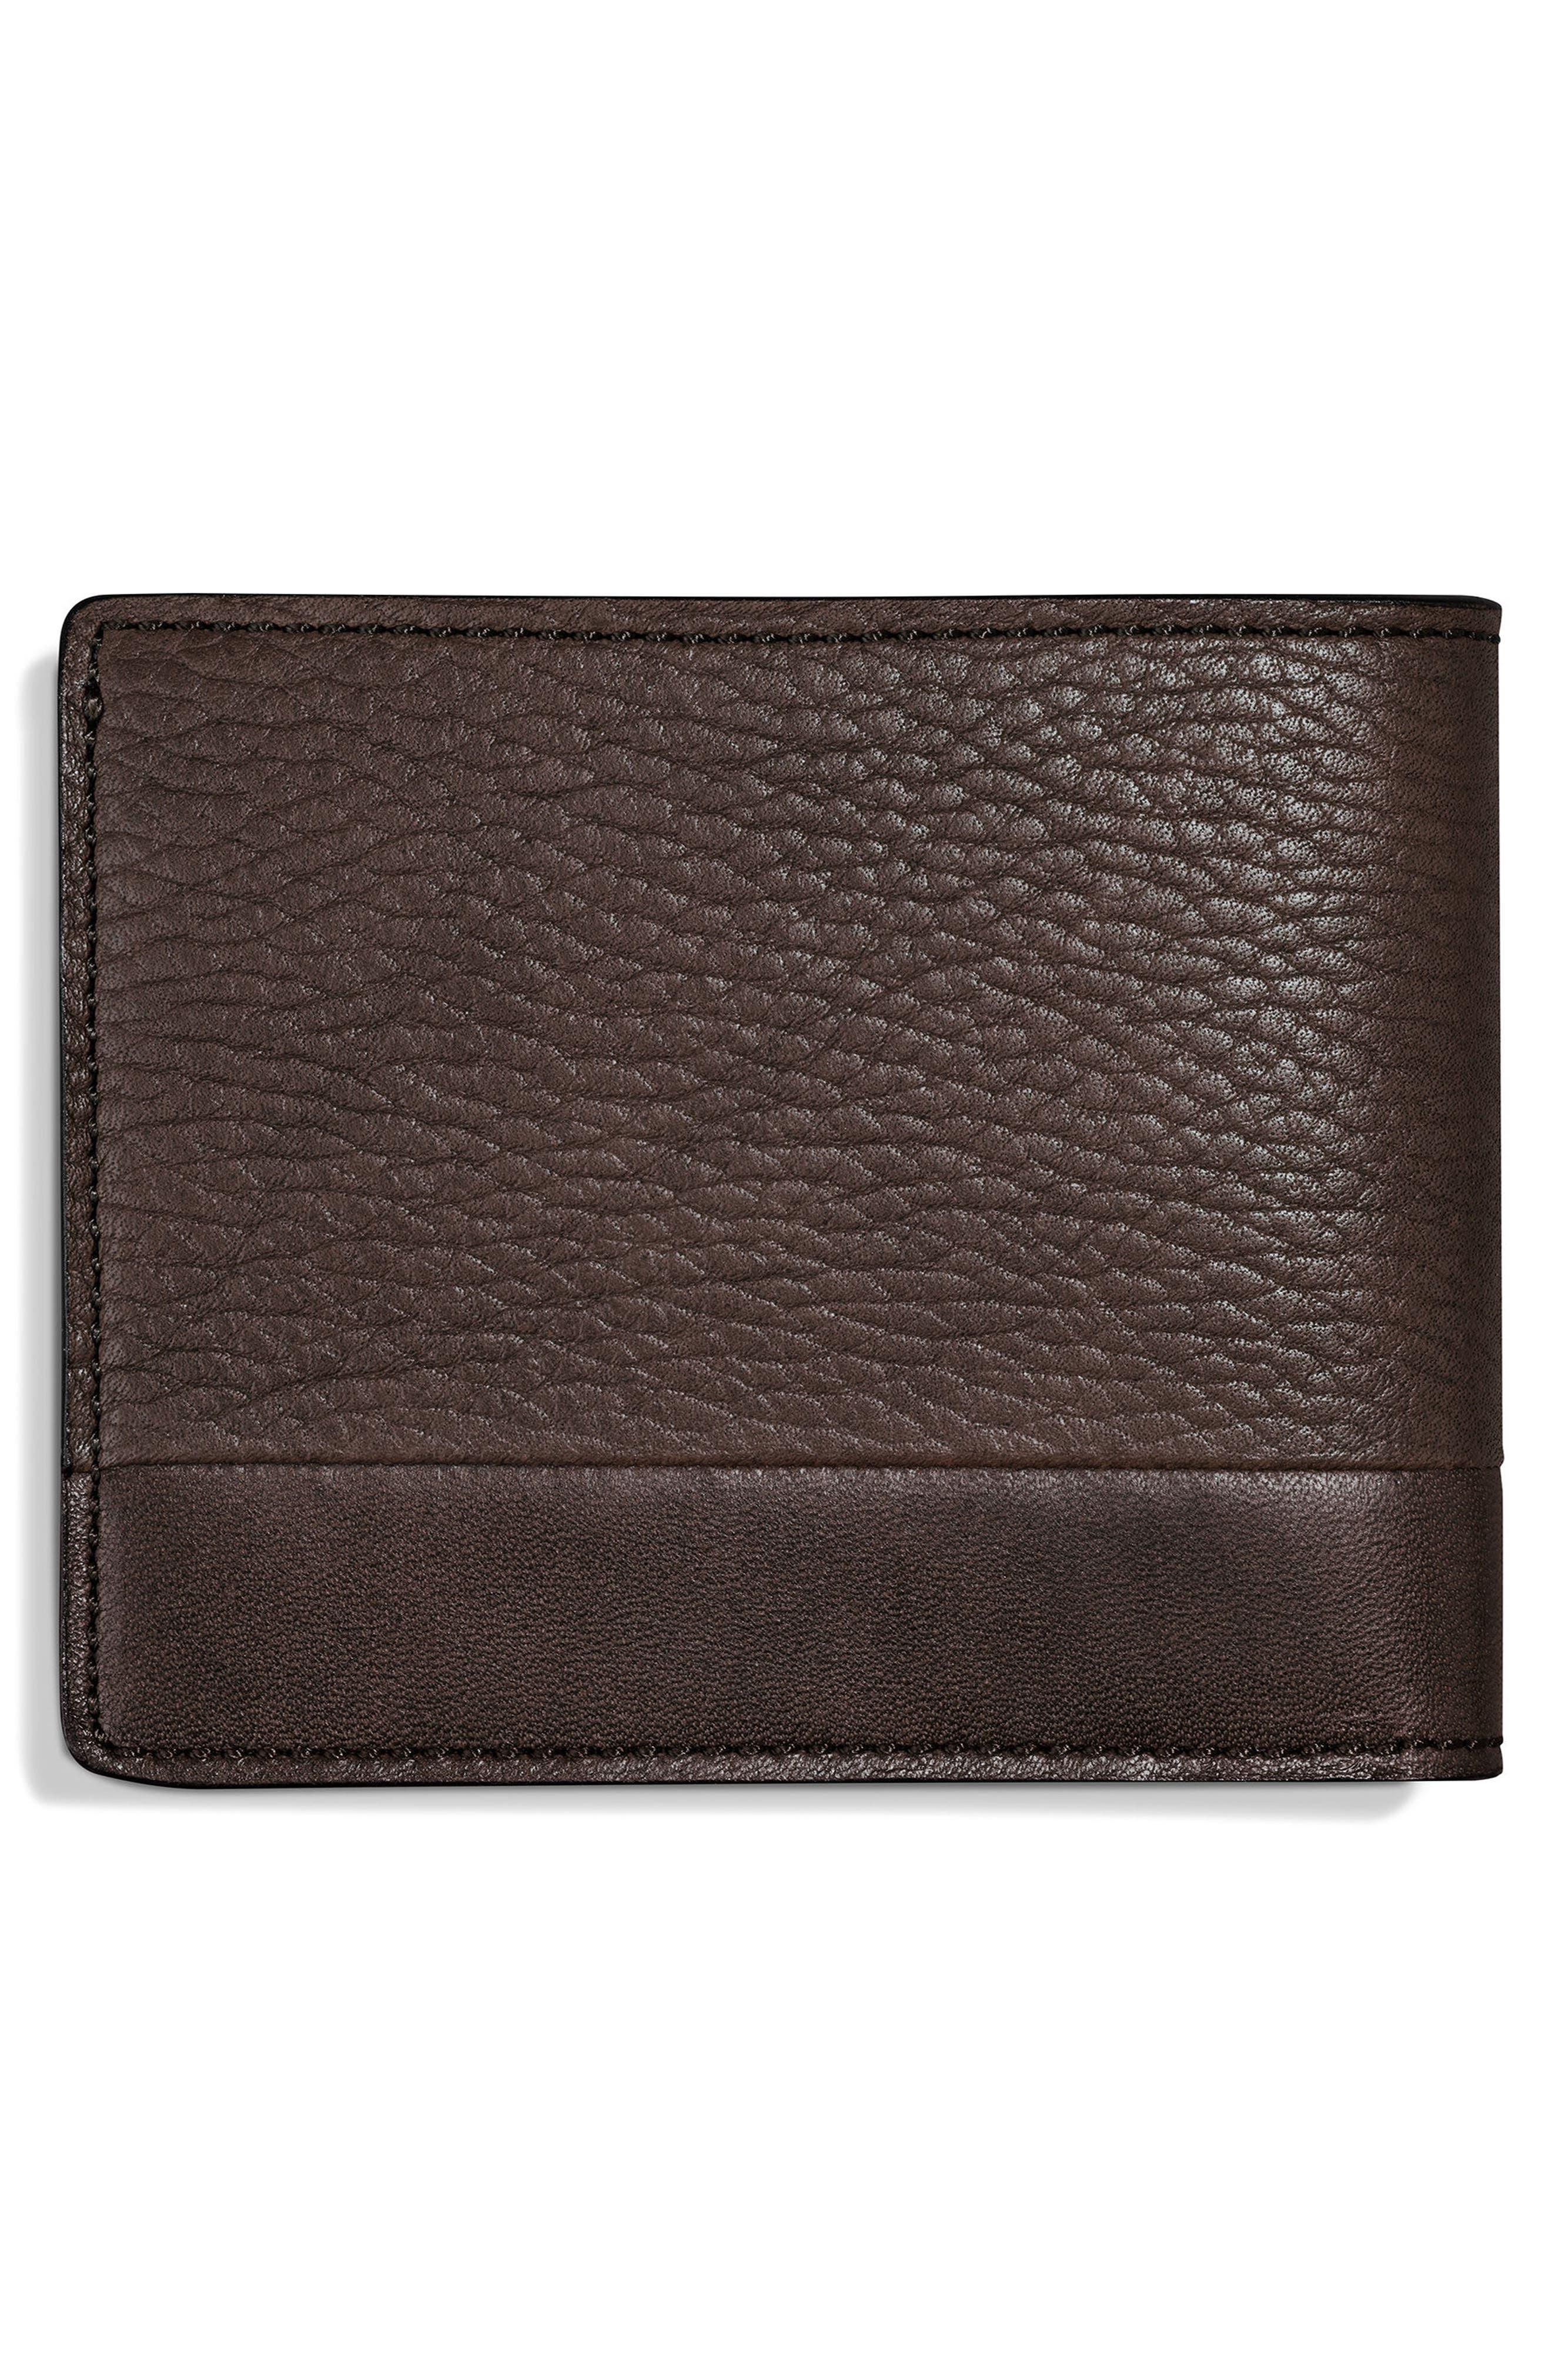 Bolt Leather Wallet,                             Alternate thumbnail 2, color,                             240